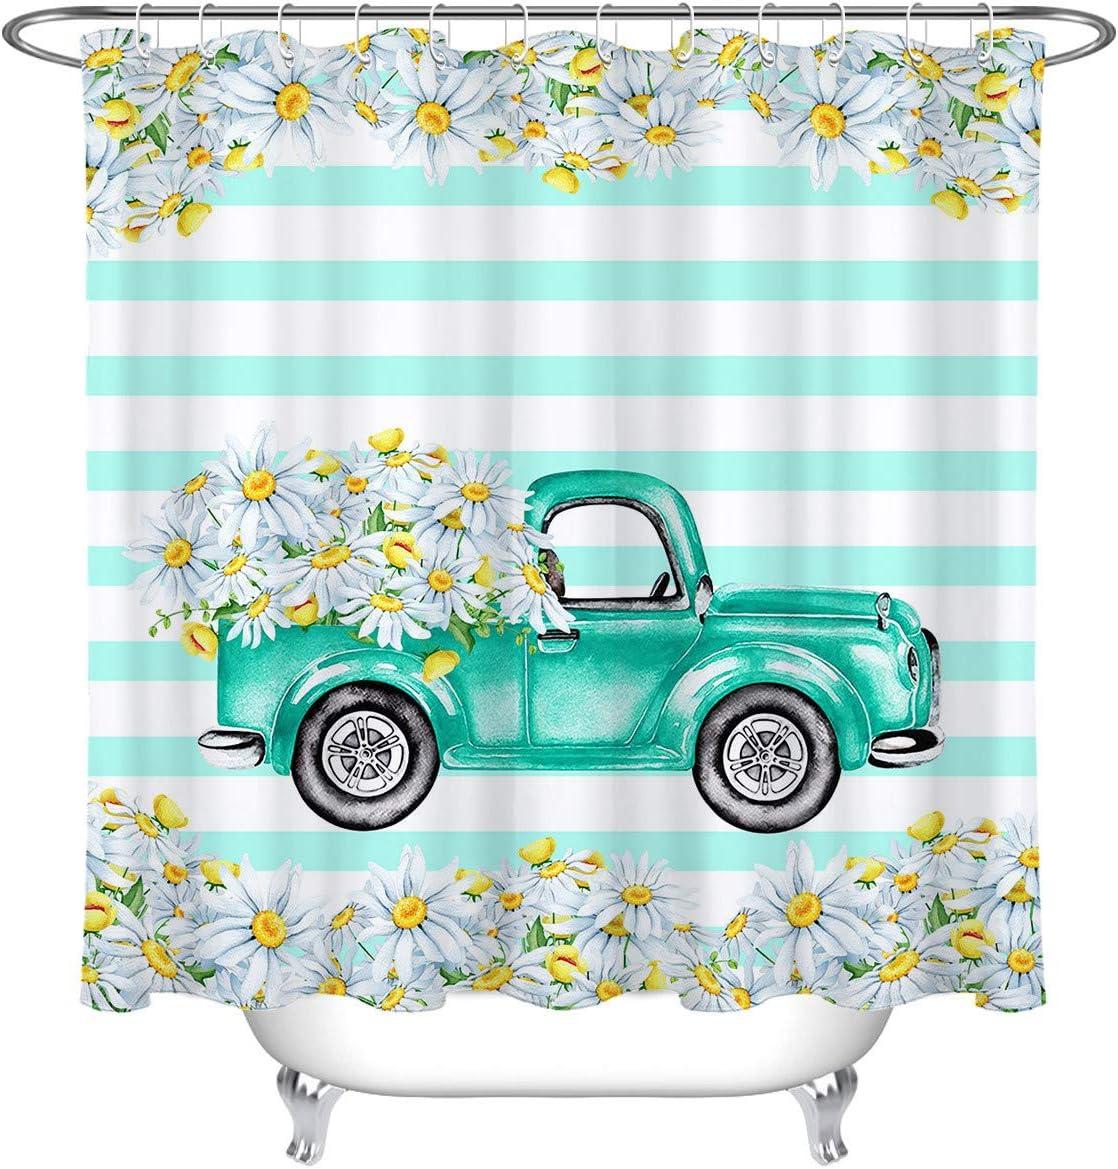 Farm Truck Autum Flowers Live Love Bathroom Shower Curtain Set Waterproof Fabric